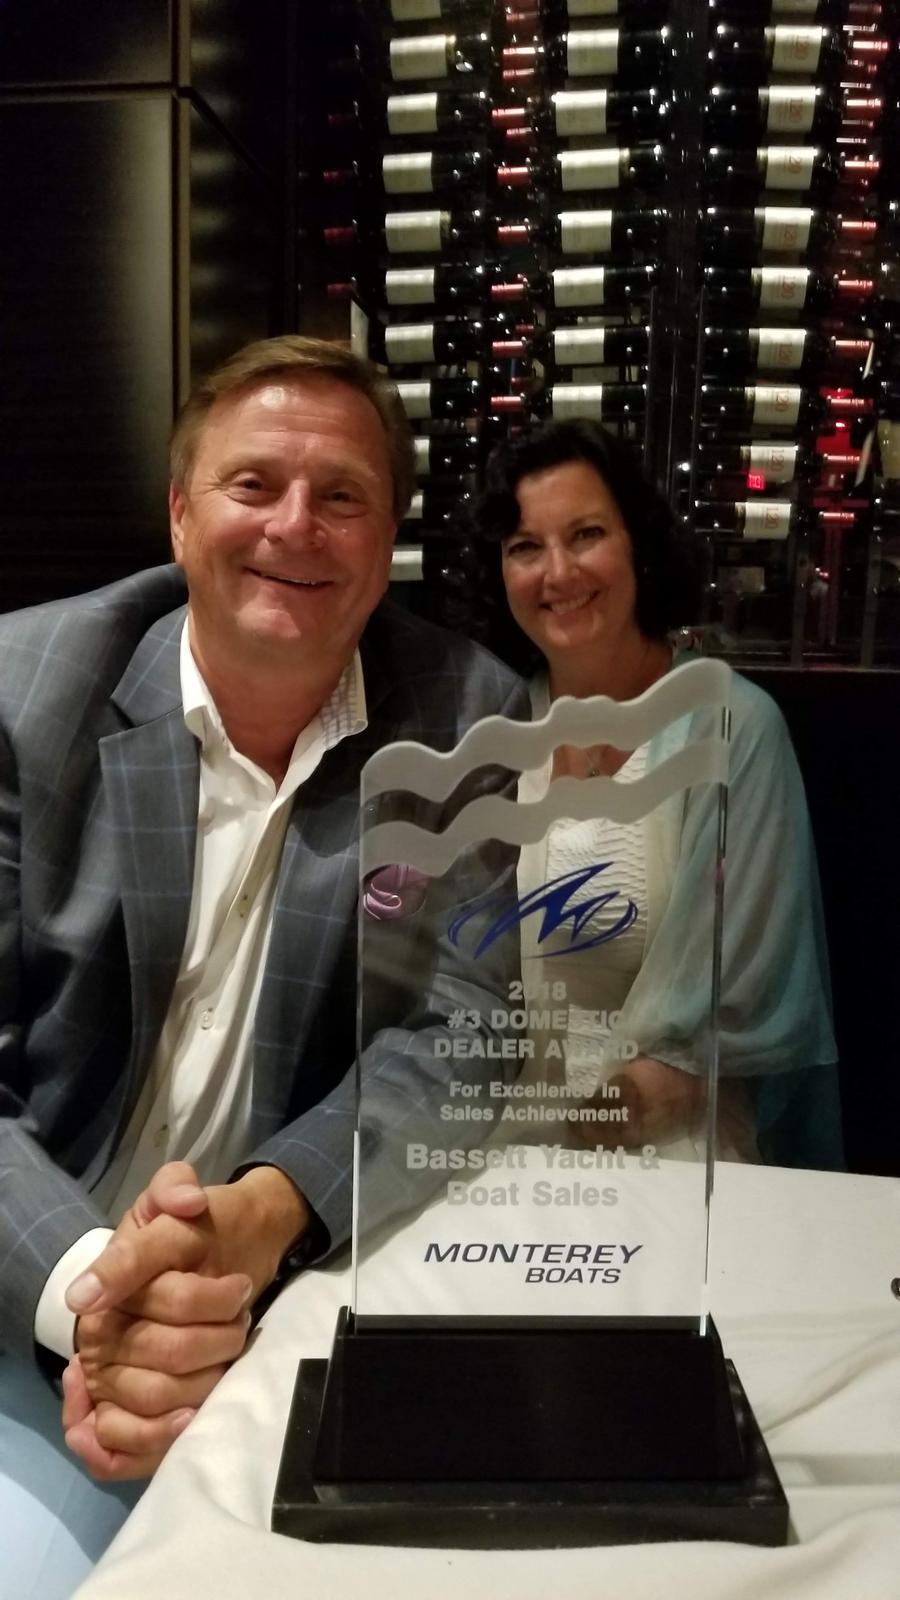 Monterrey Boats Award